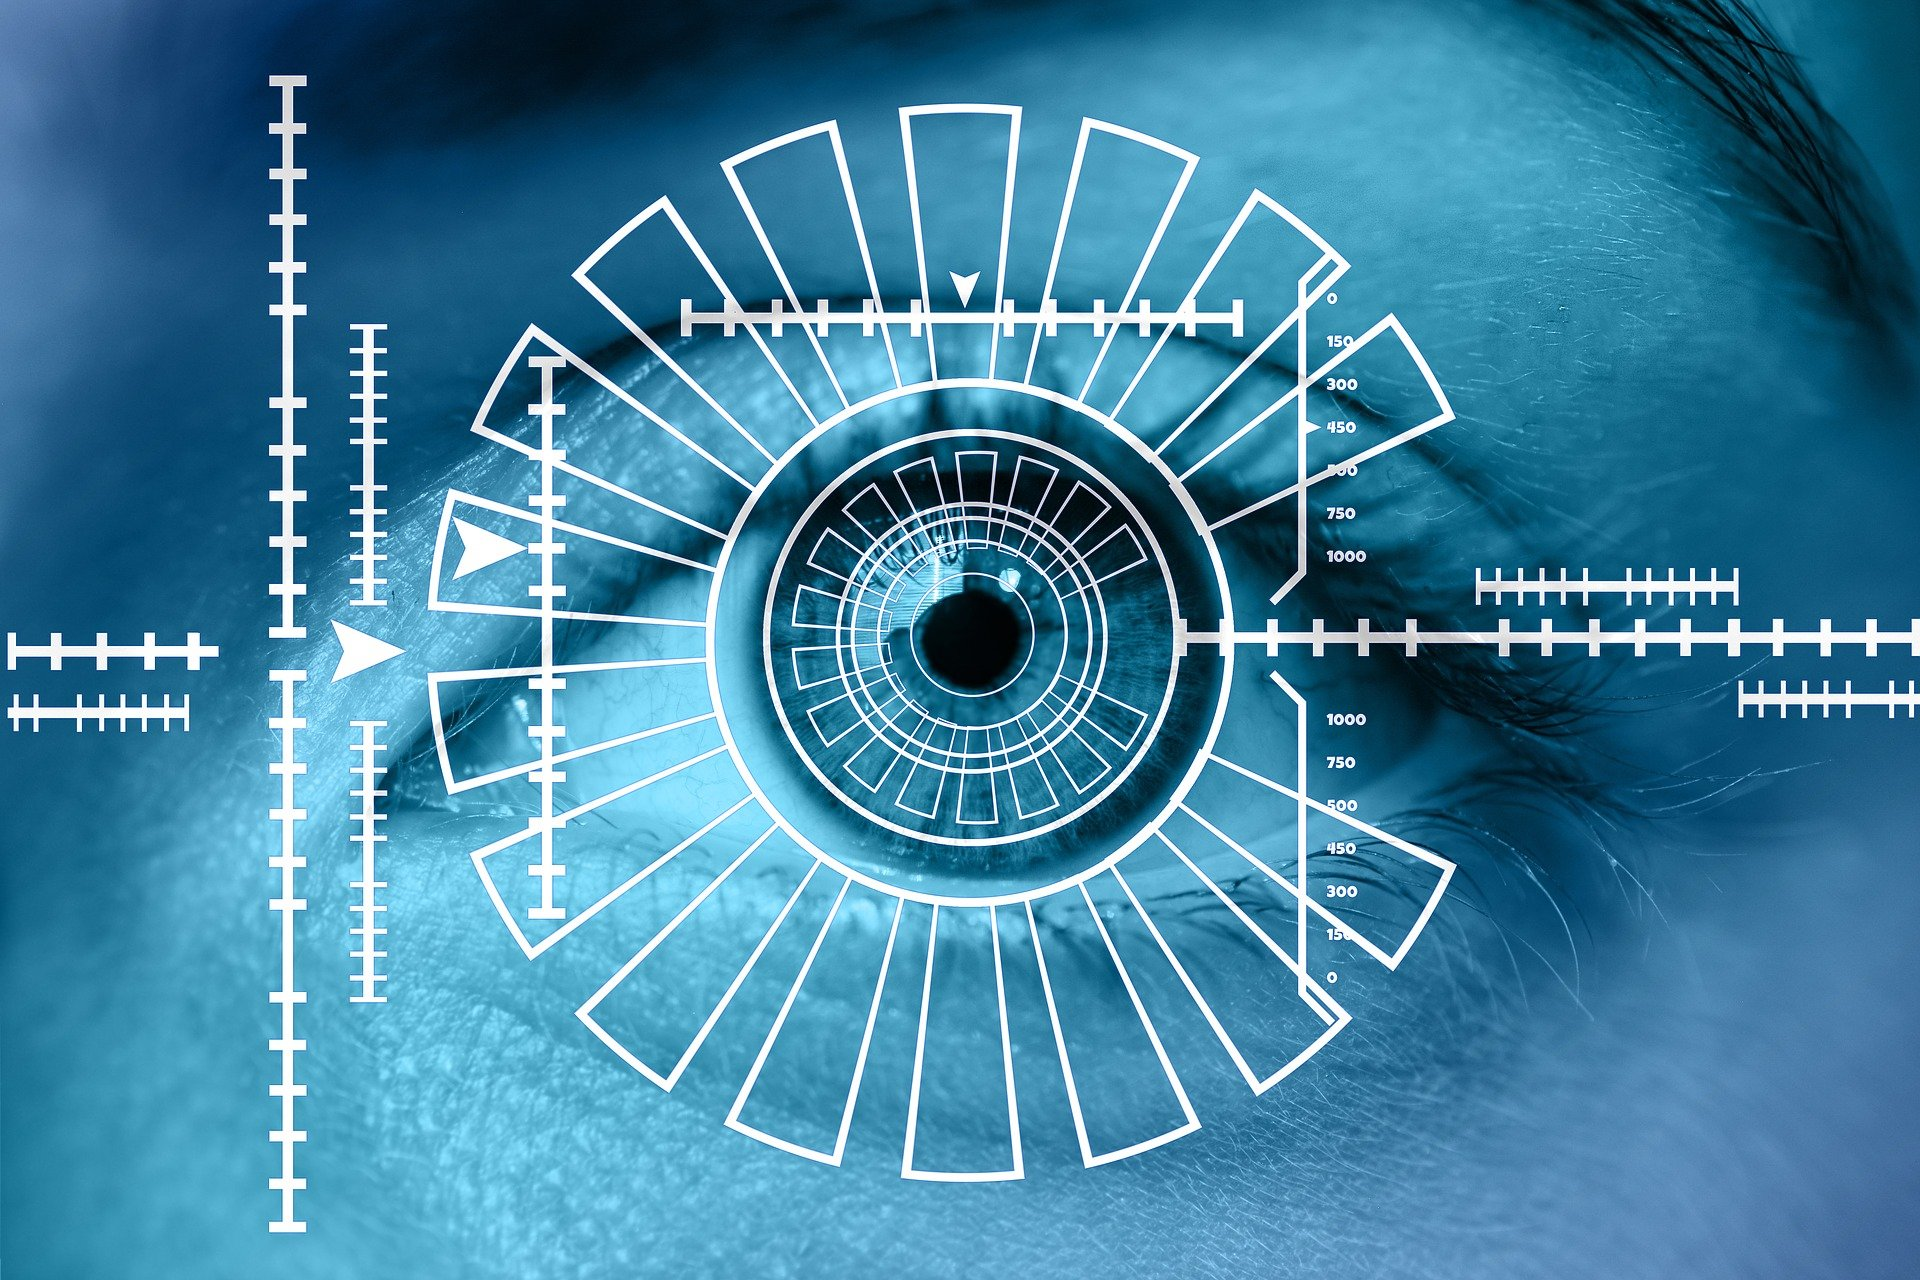 Pangiam Acquires veriScan, a biometric facial recognition system